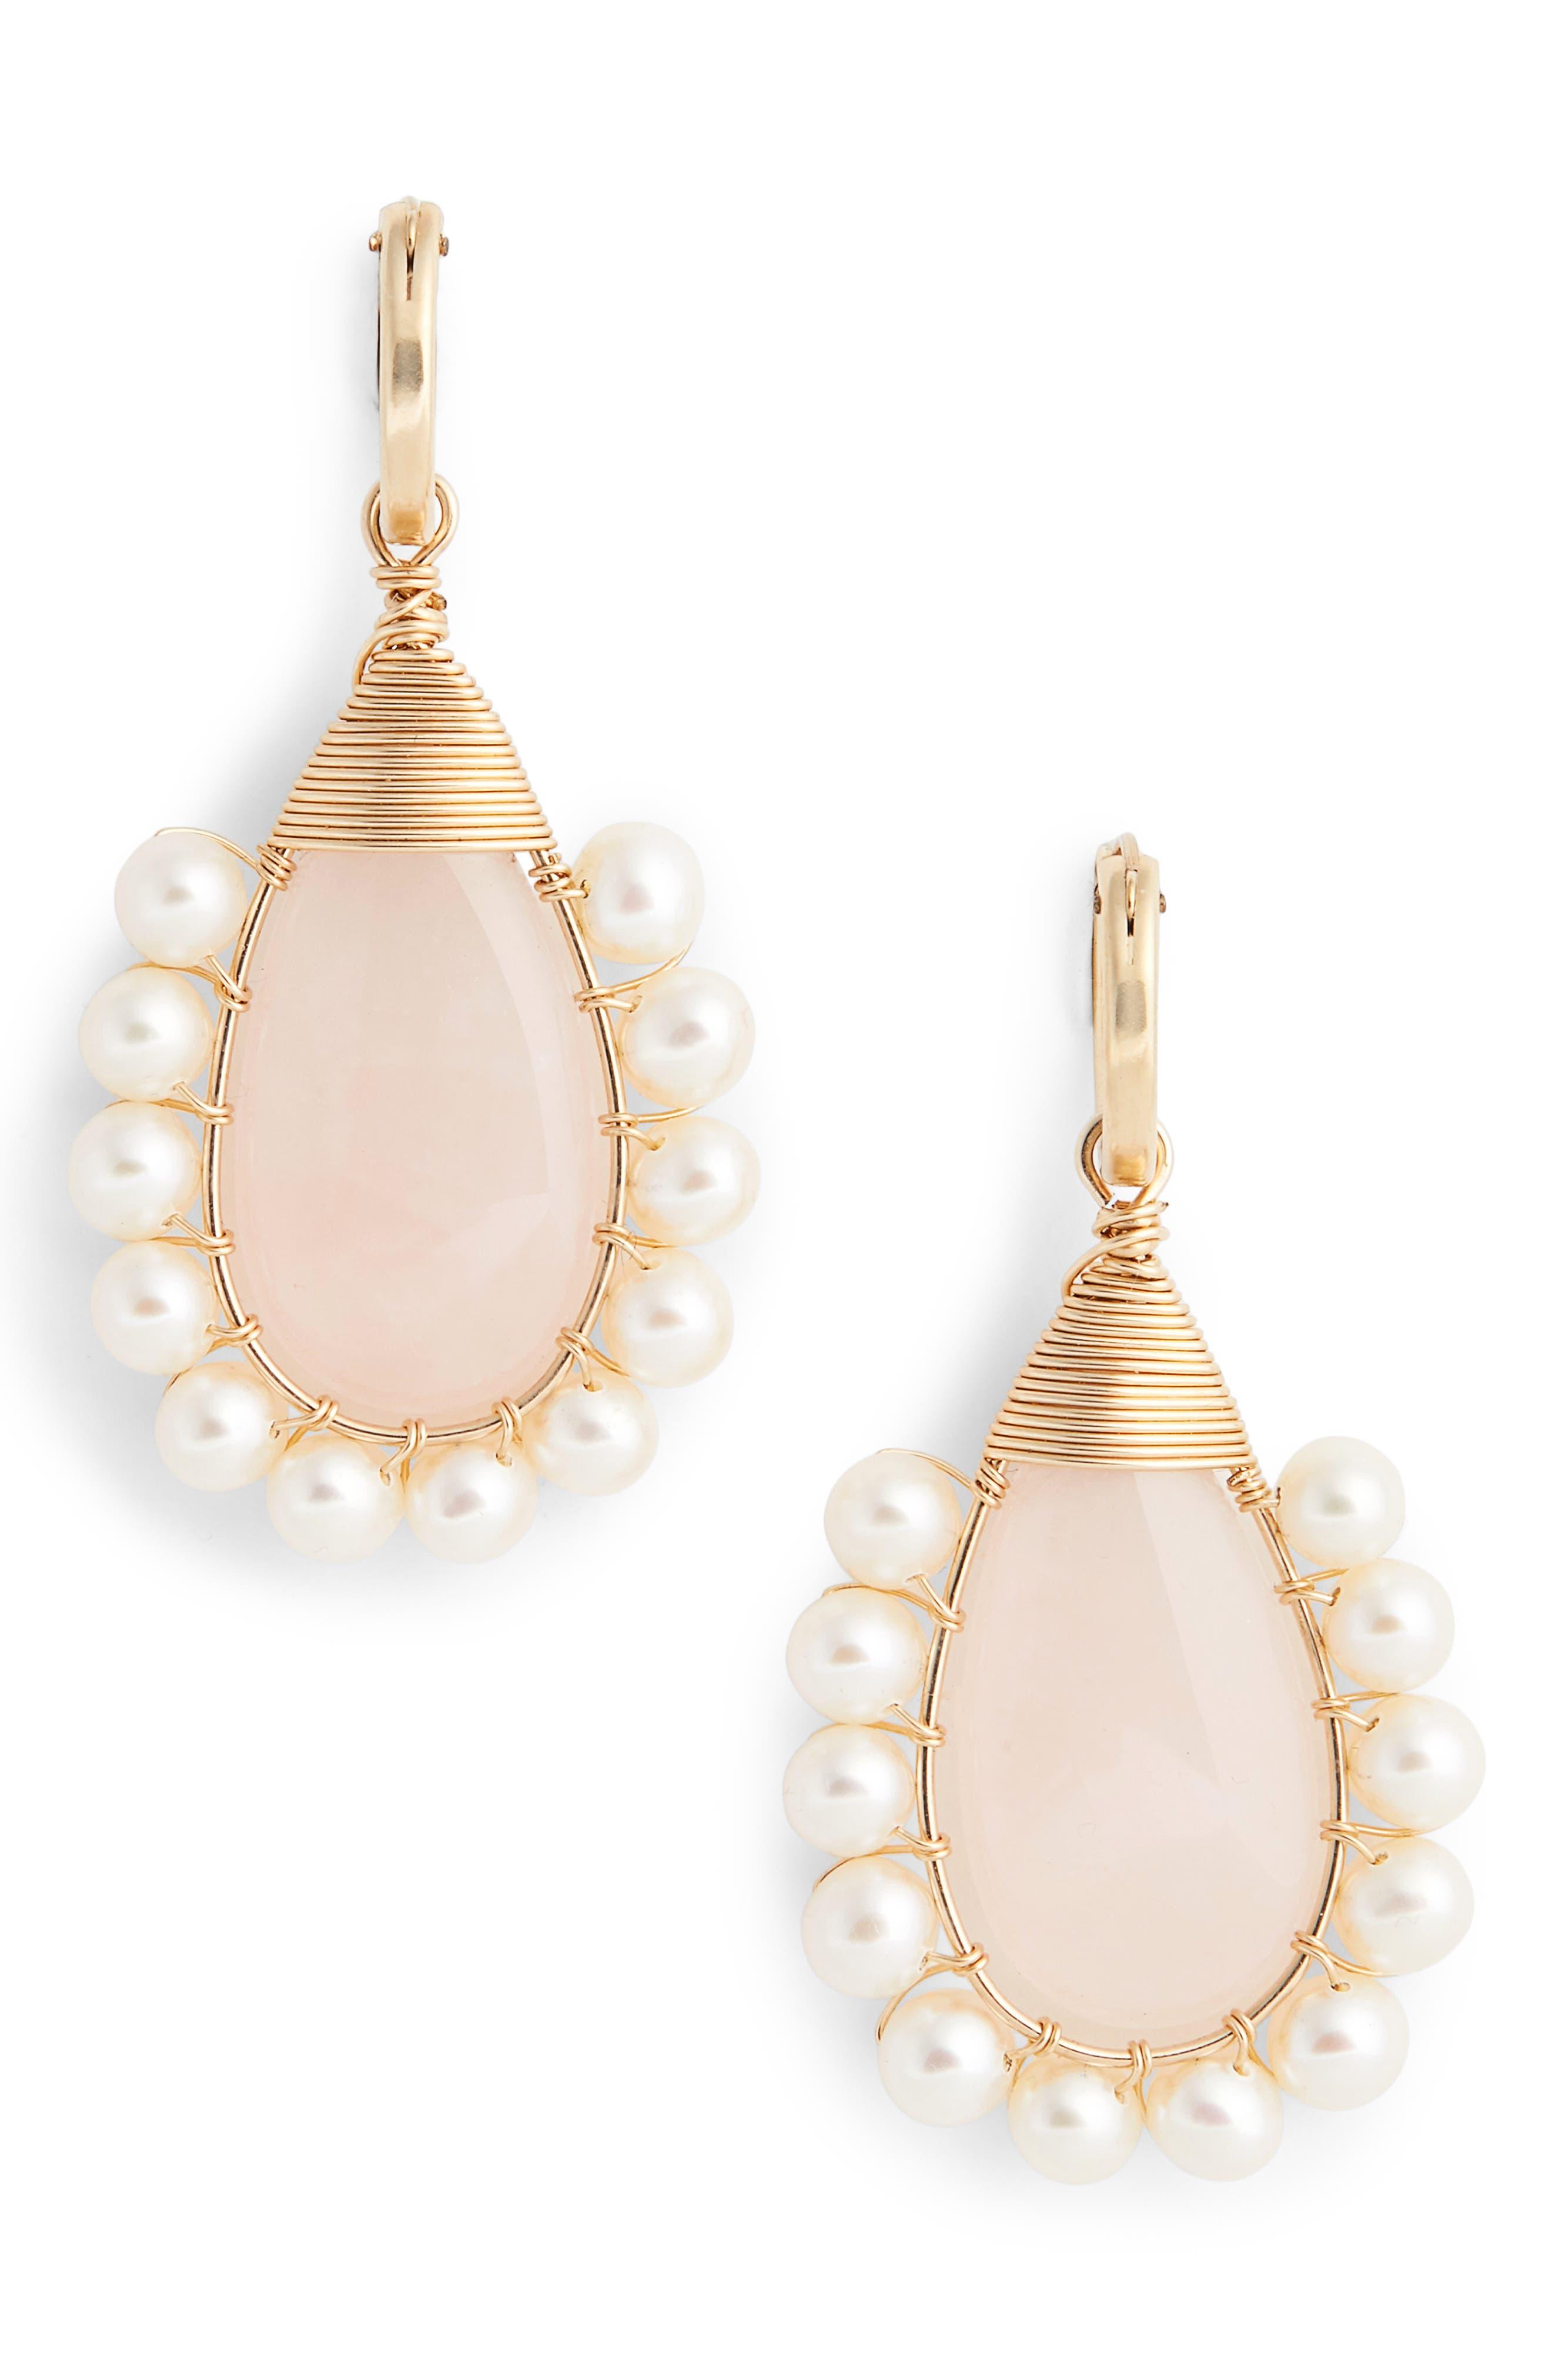 Lolita Rose Quartz & Freshwater Pearl Statement Earrings,                             Main thumbnail 1, color,                             ROSE QUARTZ